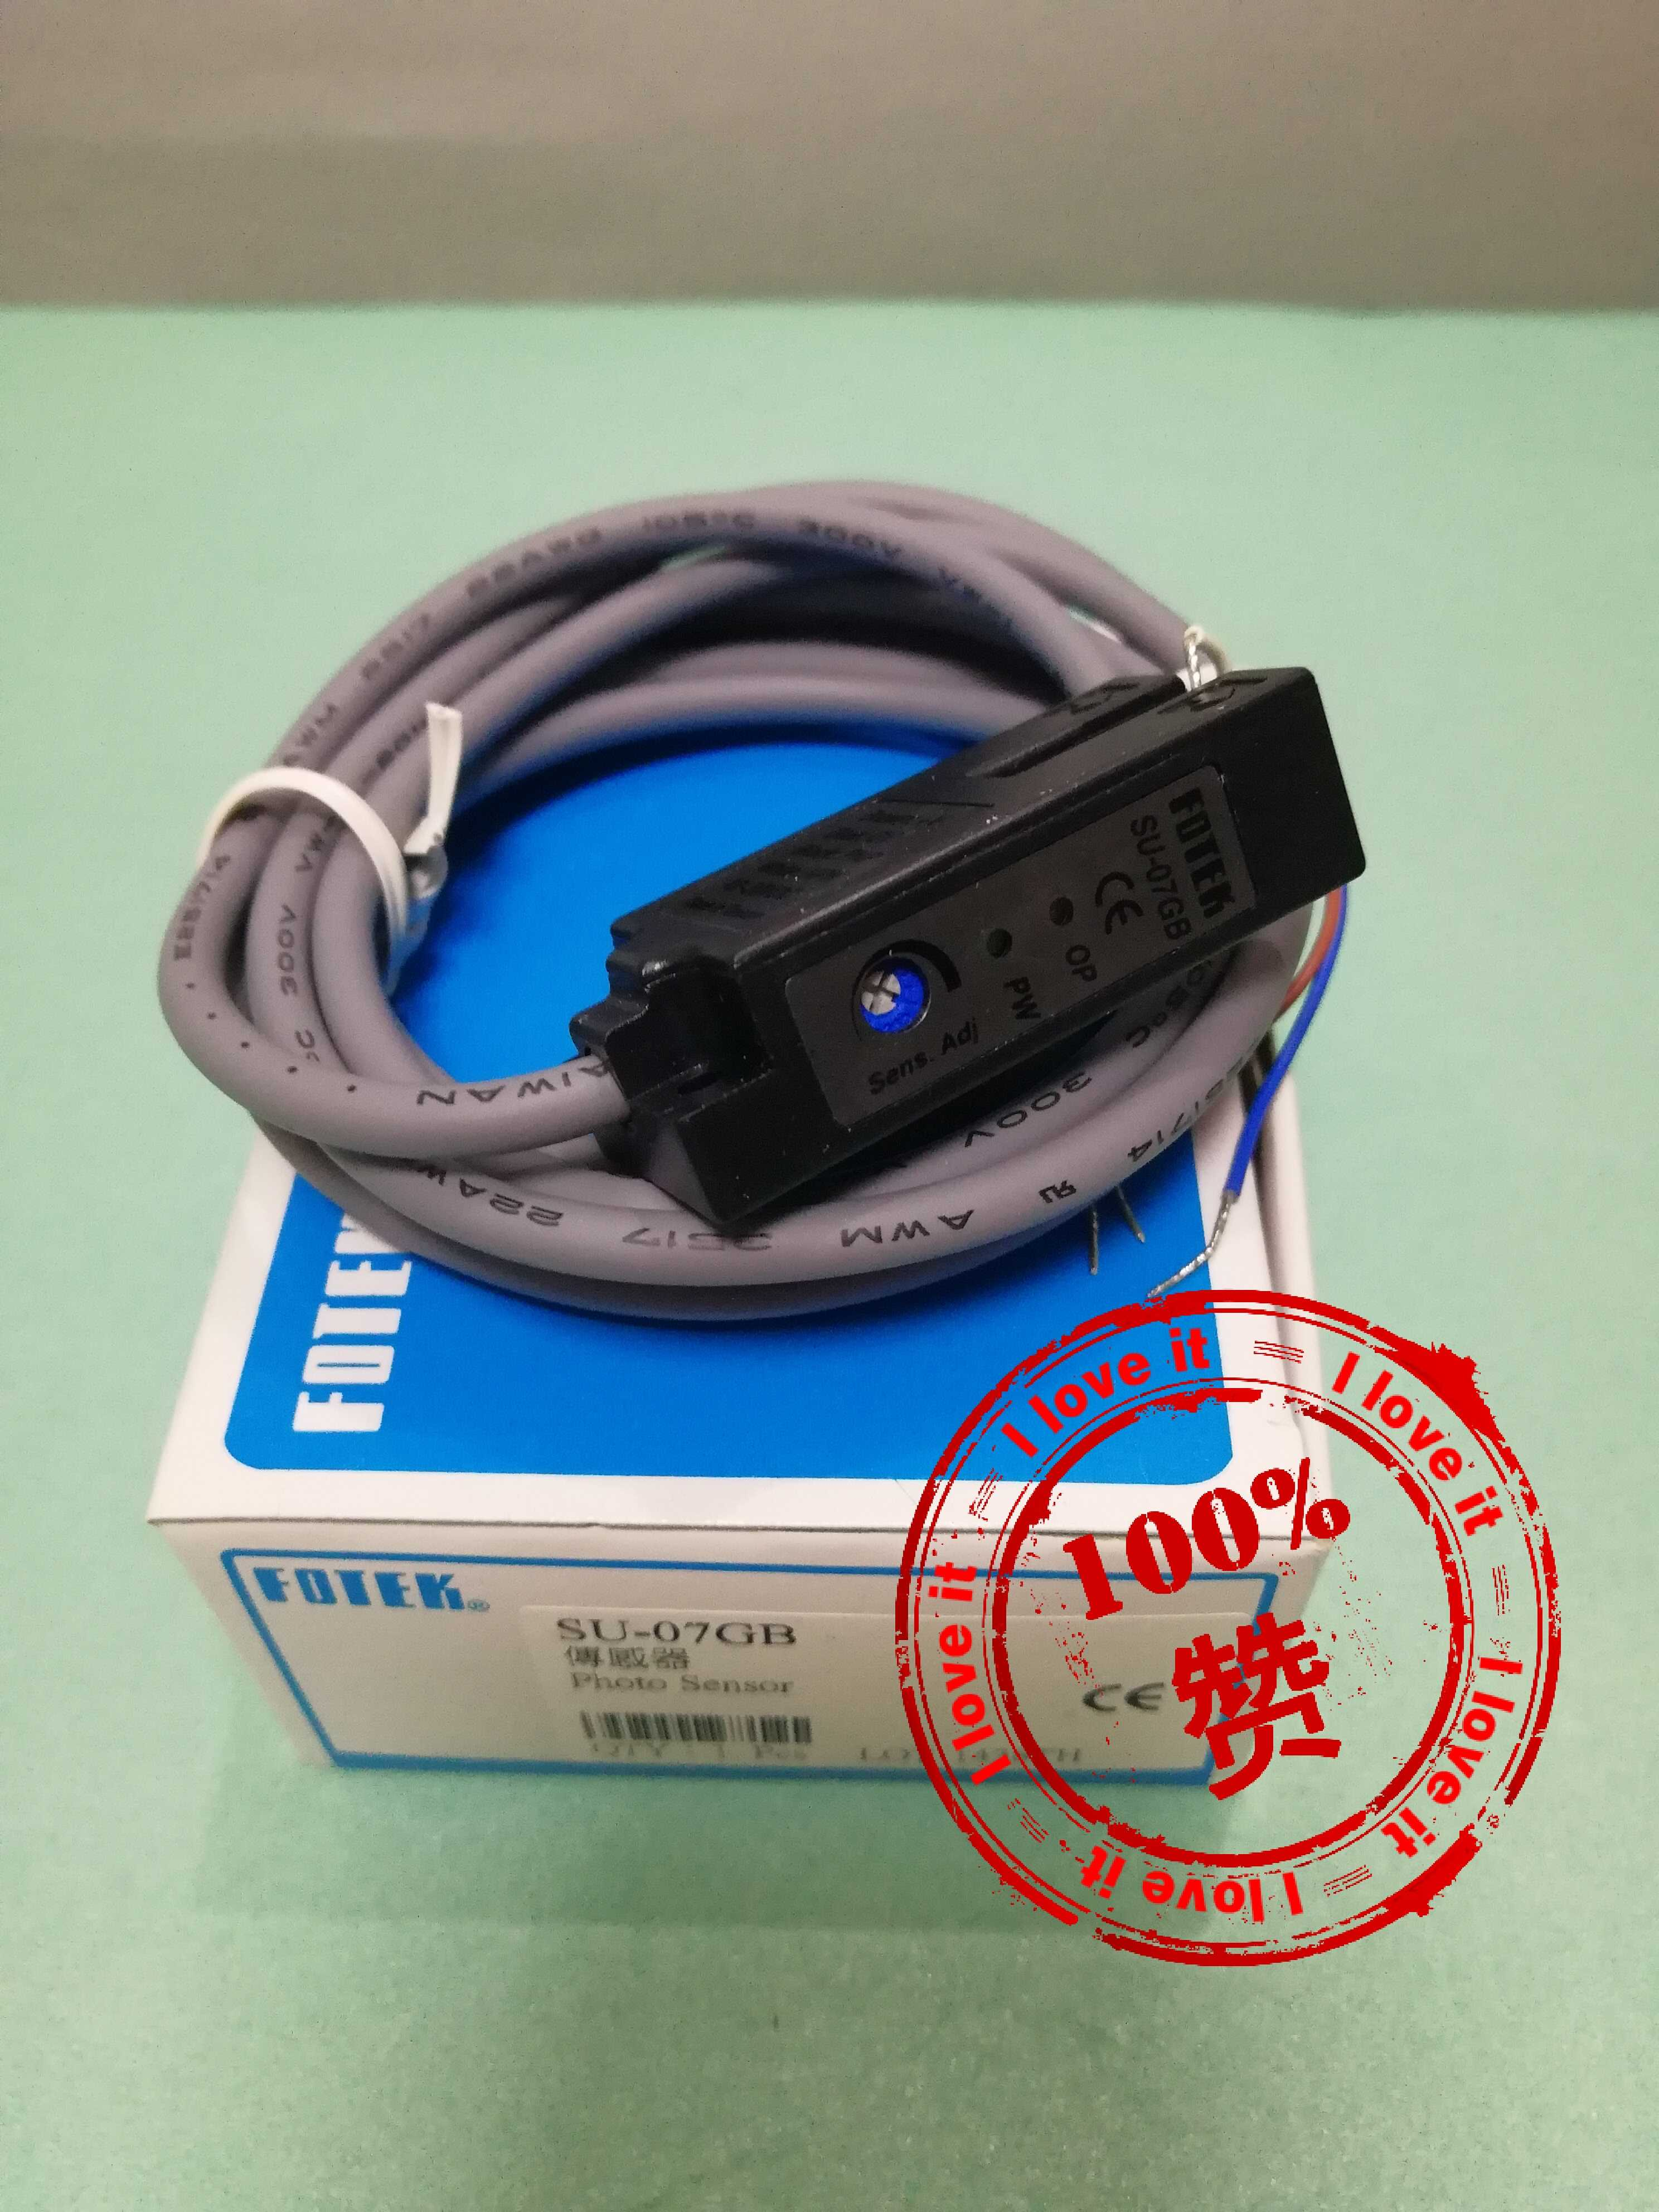 100% New Imported Photoelectric Sensor SU-07GB Normally Closed NPNPNP100% New Imported Photoelectric Sensor SU-07GB Normally Closed NPNPNP